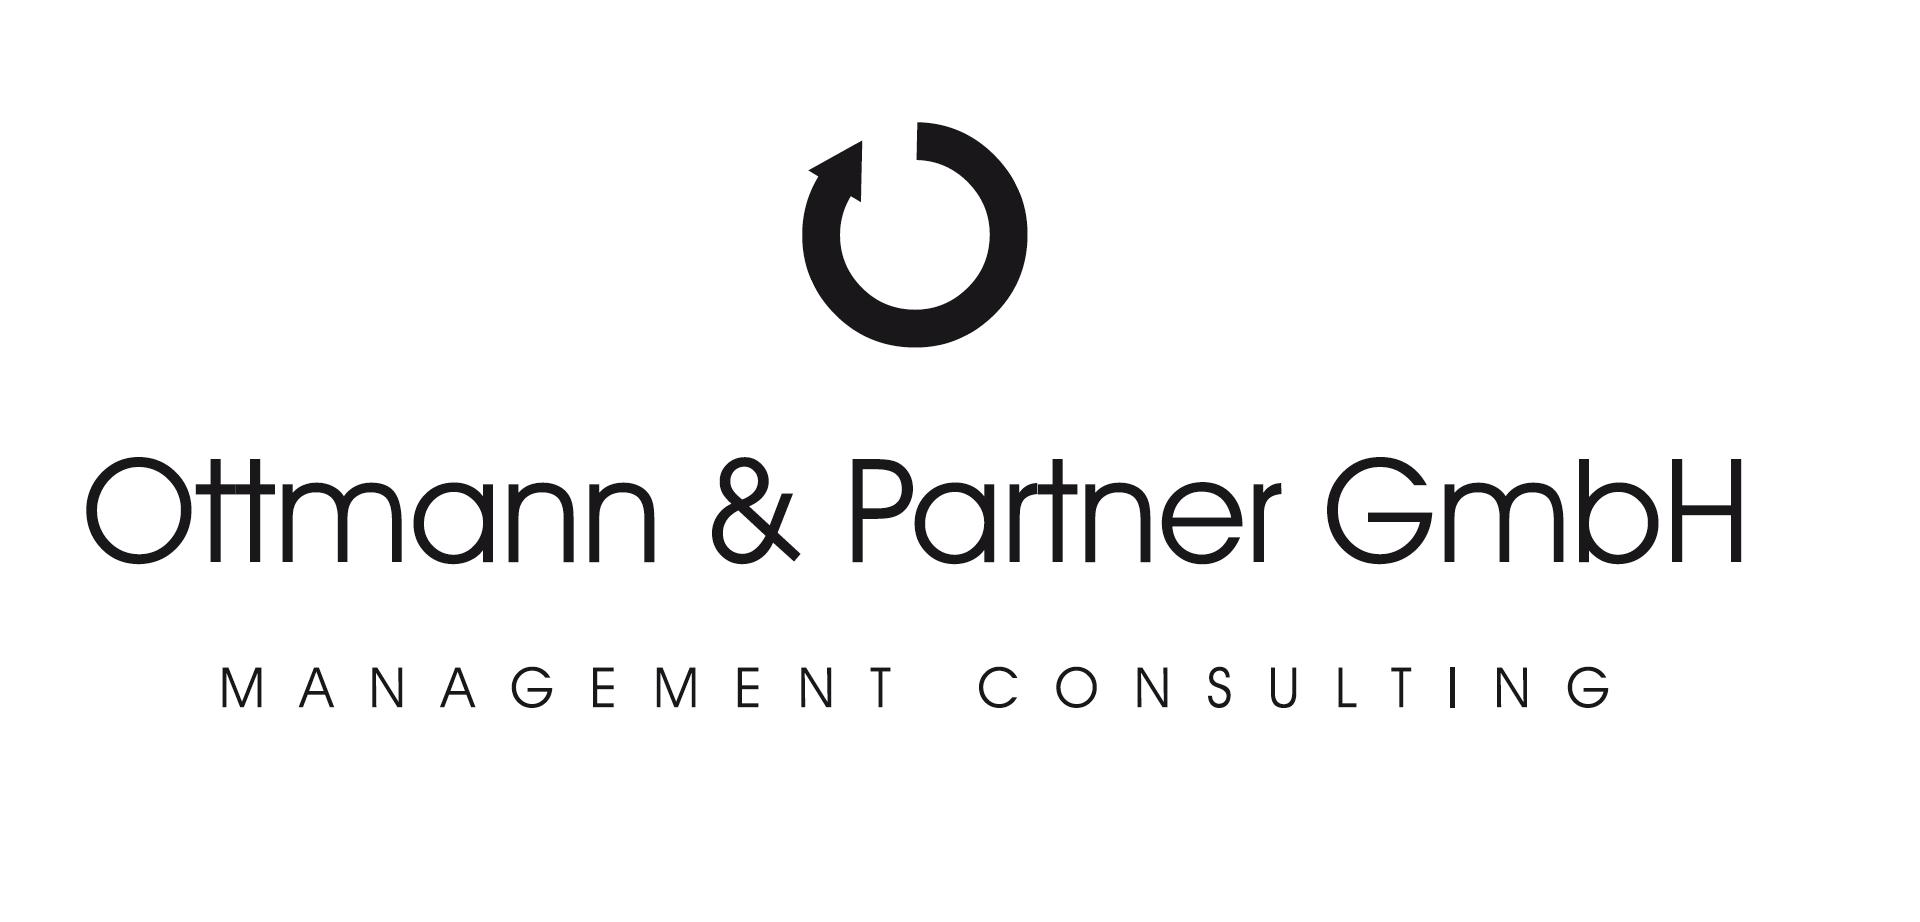 Ottmann & Partner GmbH